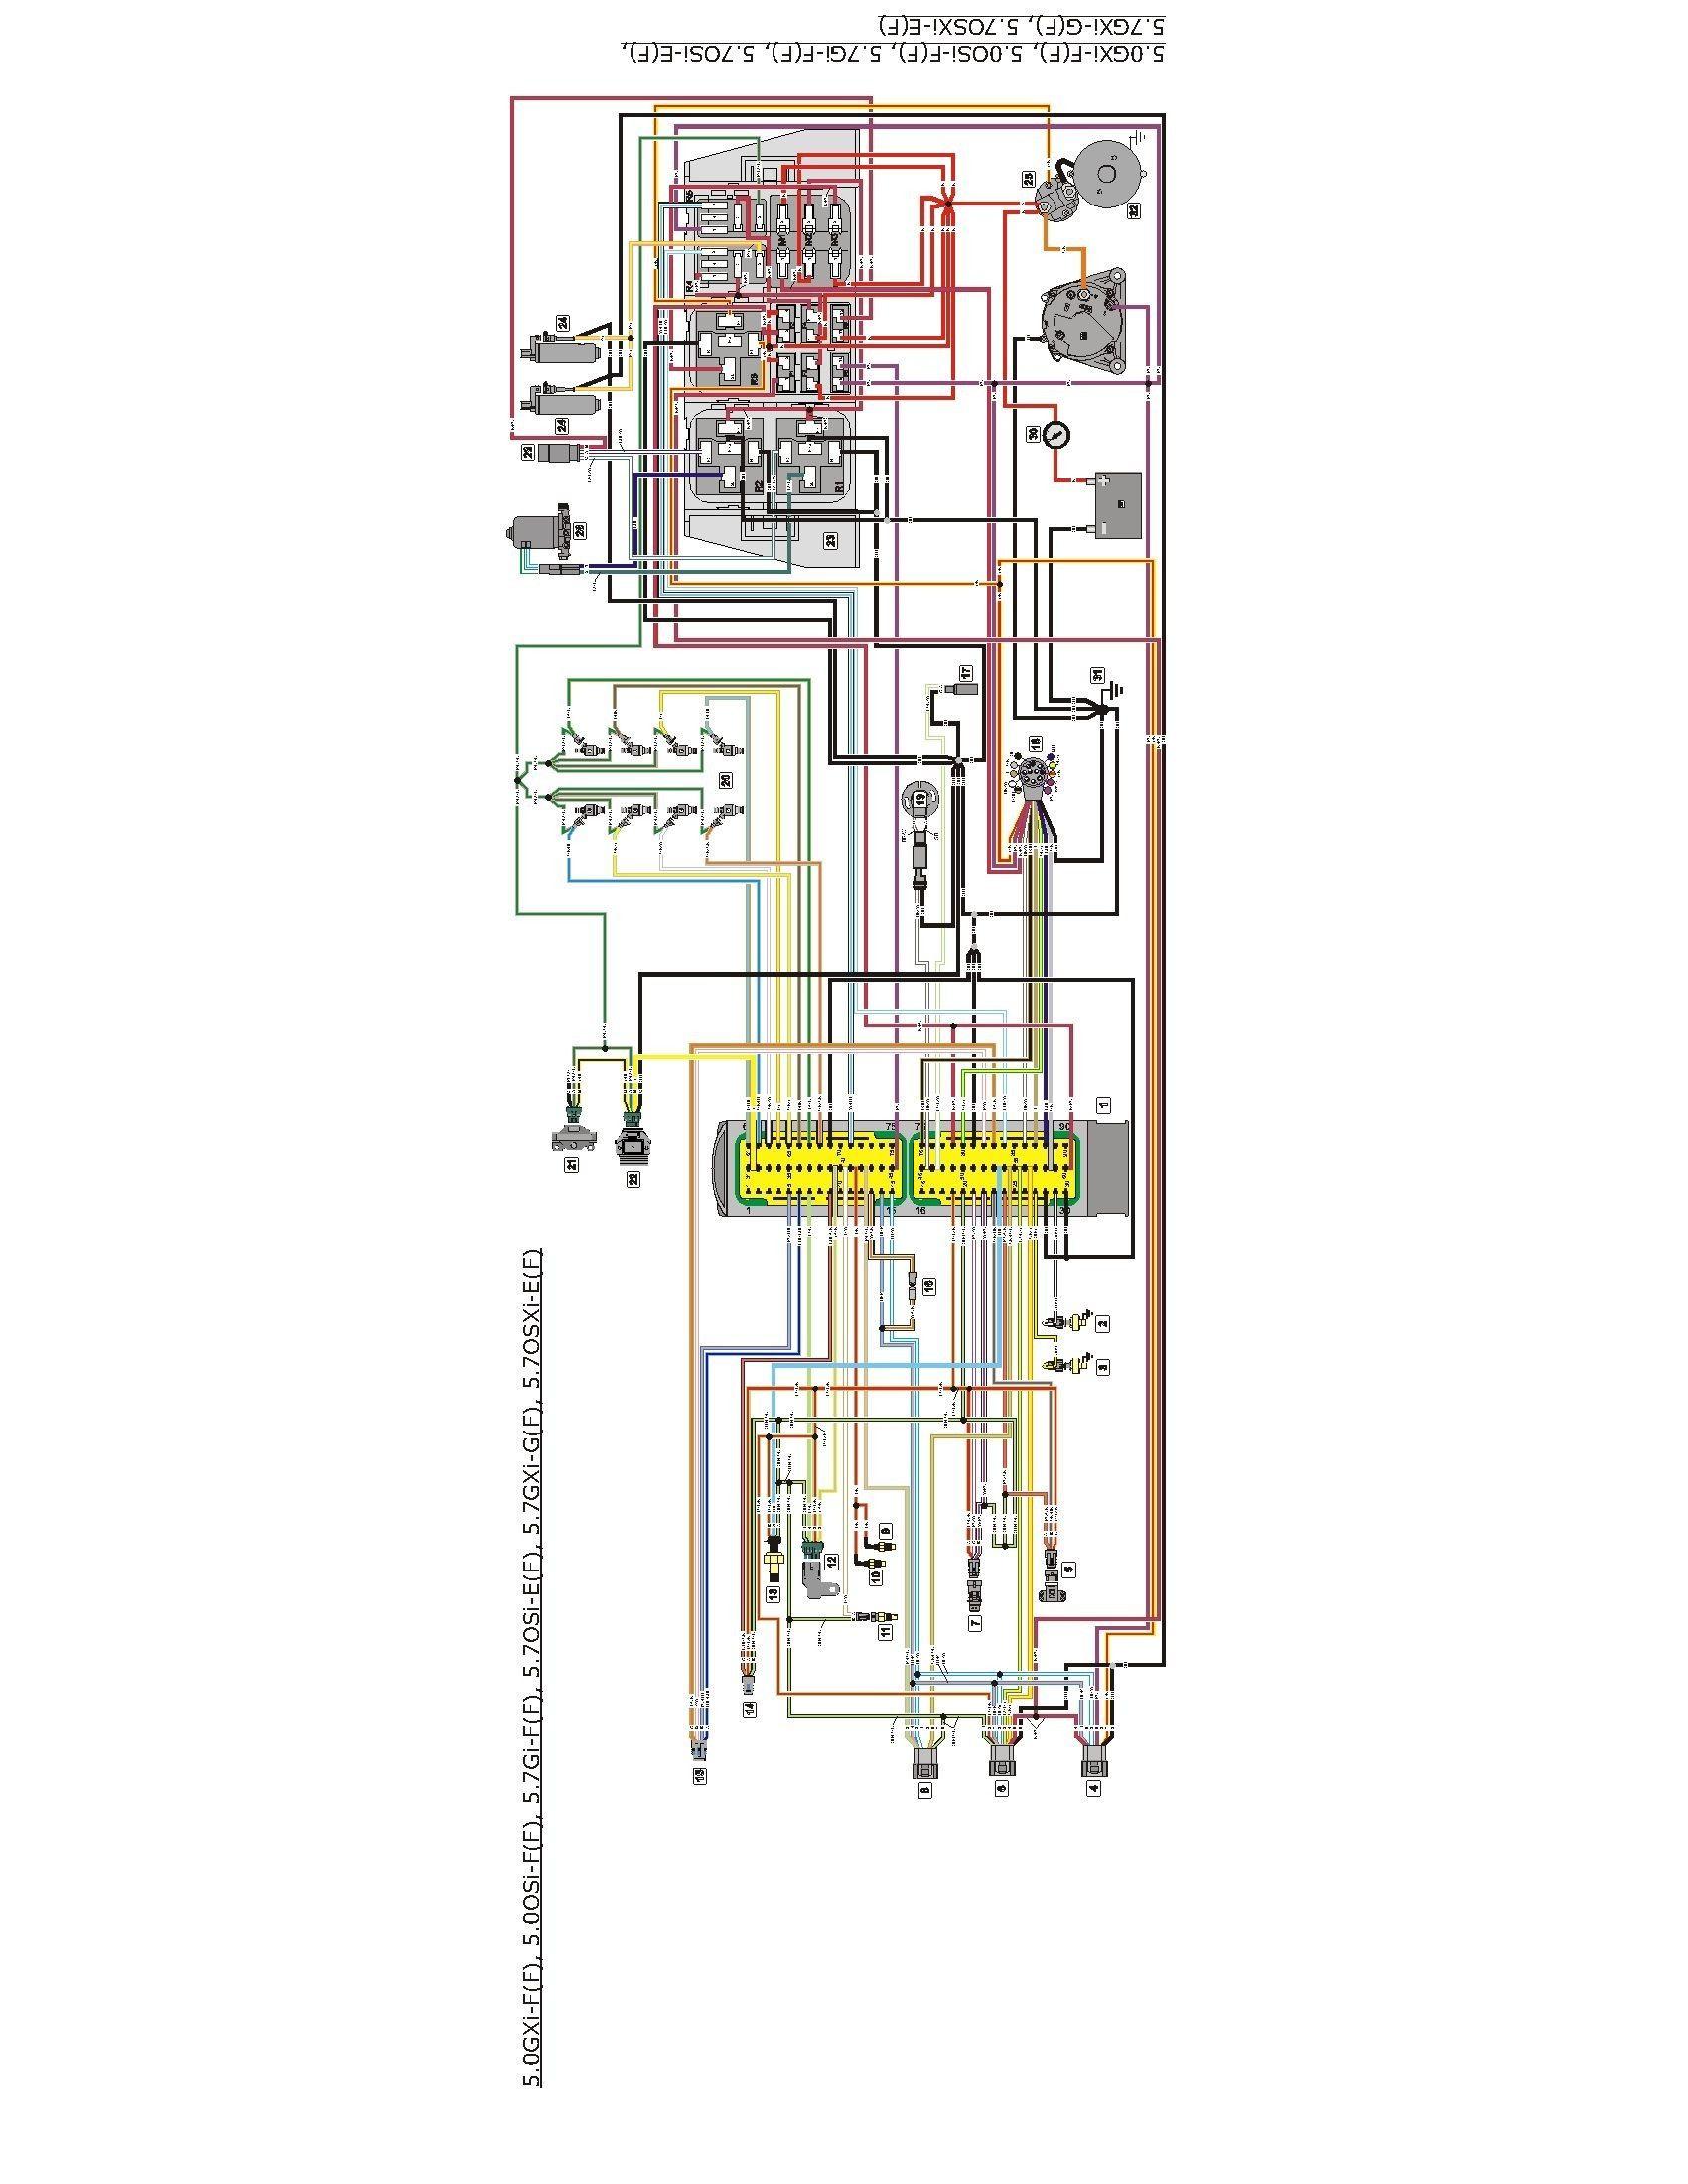 60 Awesome Volvo Penta Starter Wiring Diagram Volvo Diagram Trailer Light Wiring